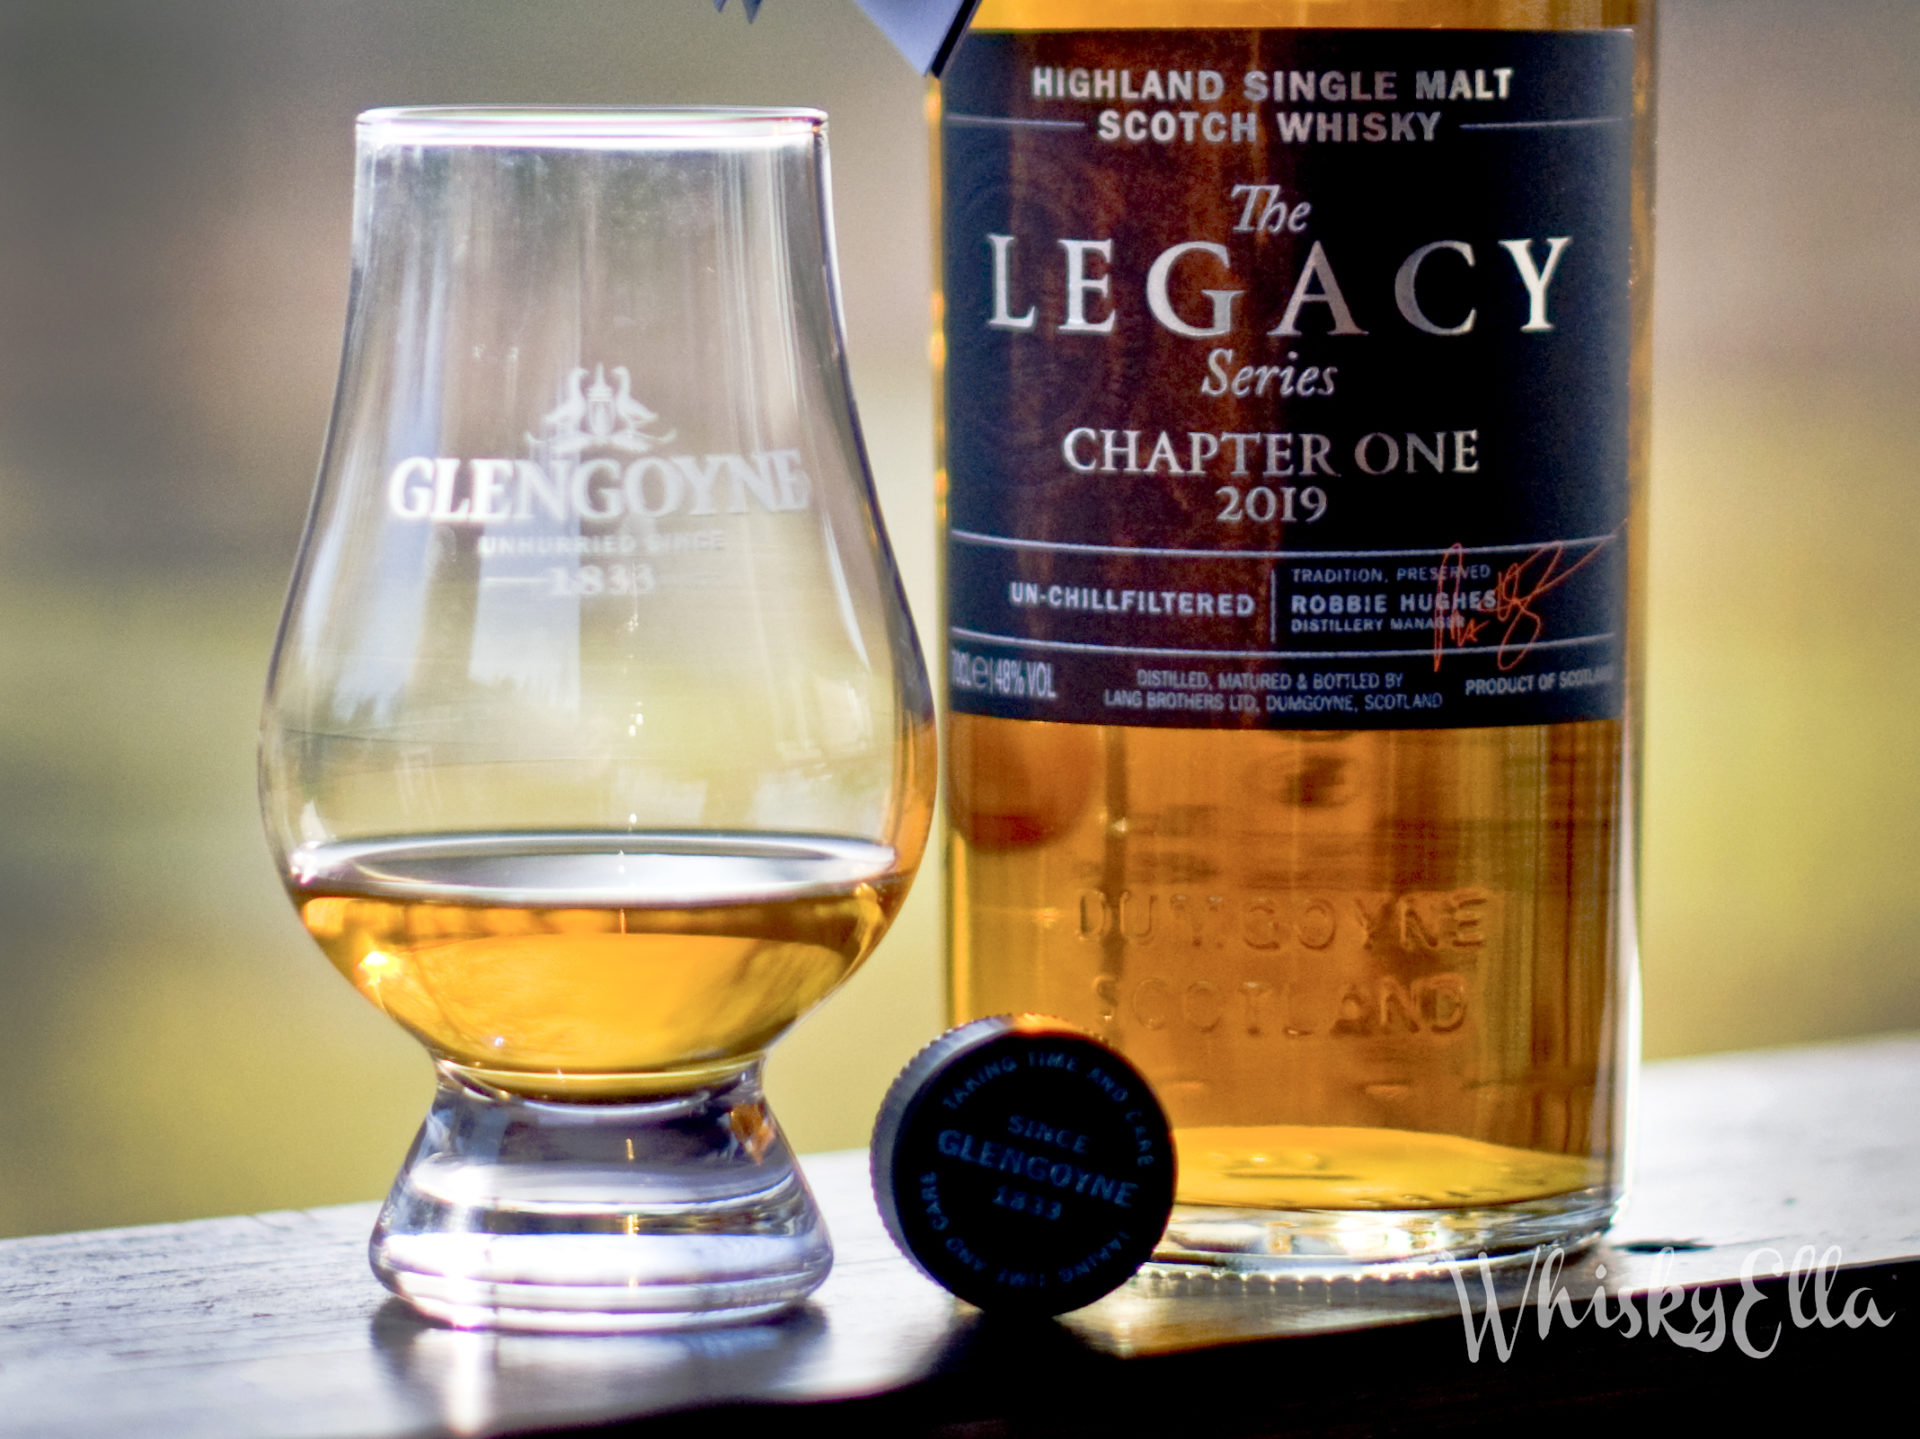 Nasza recenzja Glengoyne Legacy Serie Chapter One 2019 #19